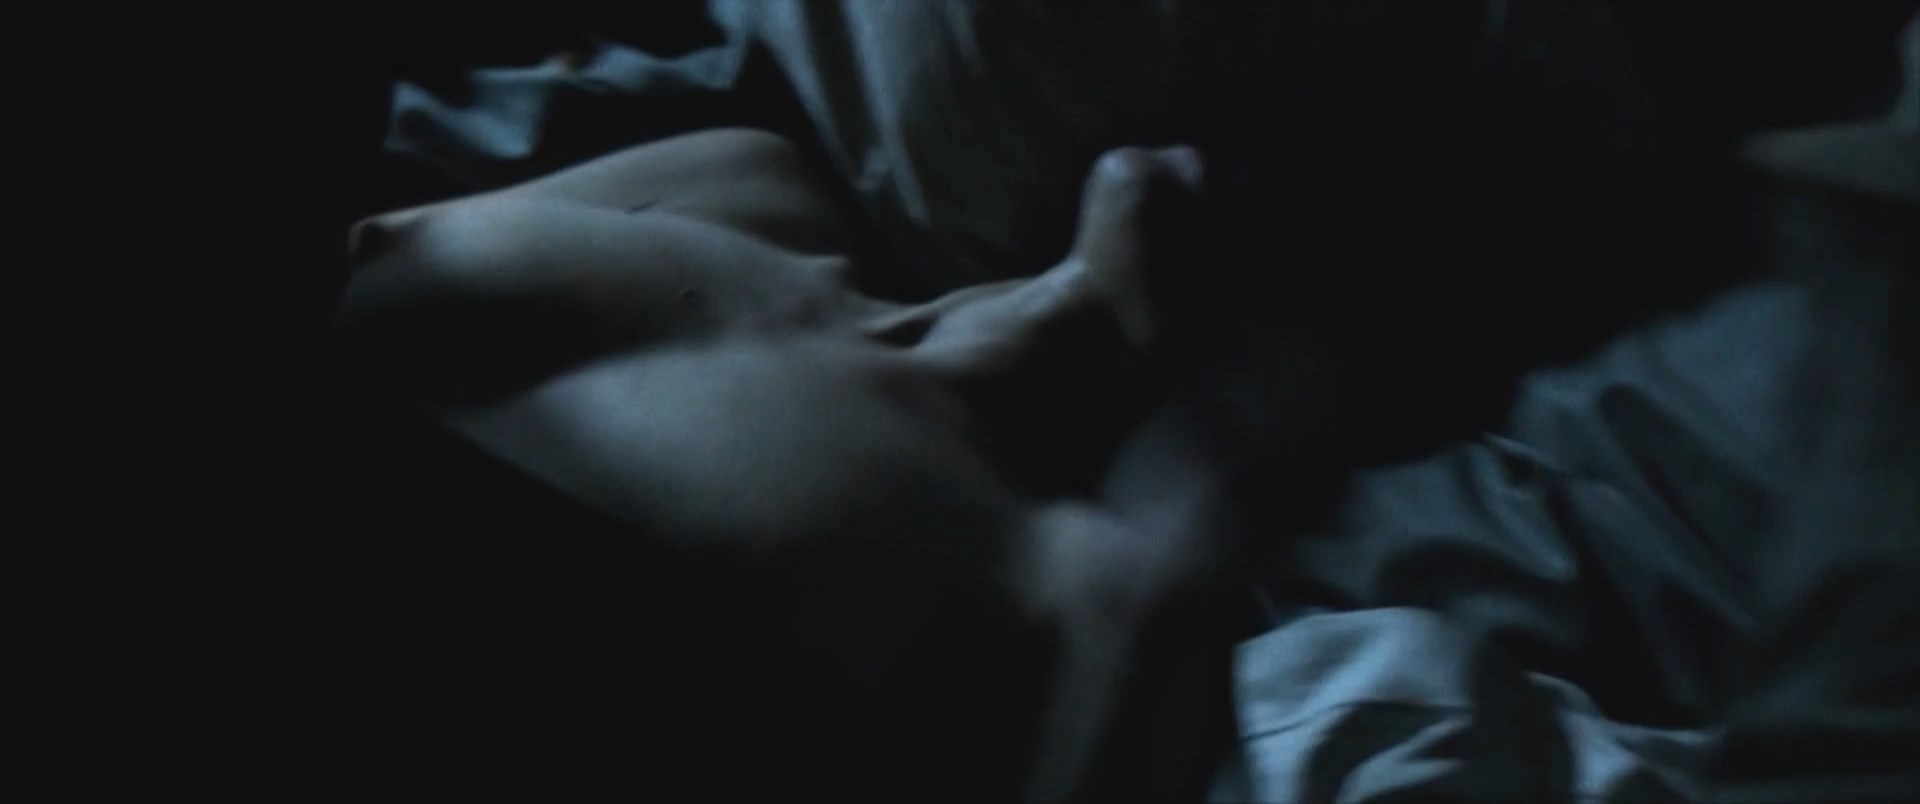 Nikki sims orgasm